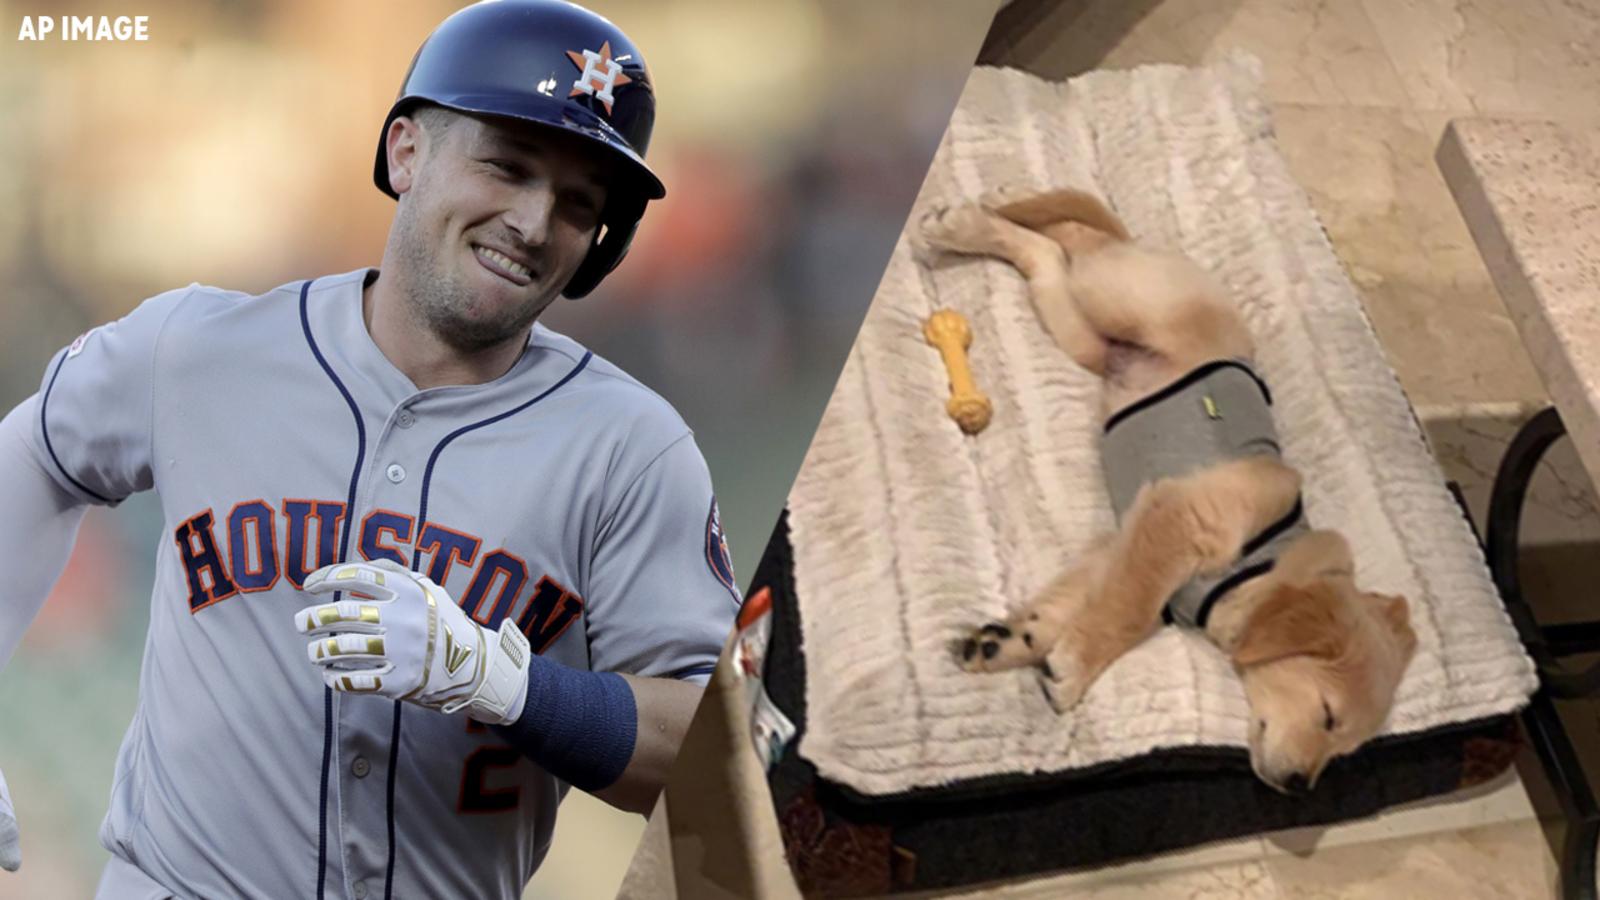 Astros Alex Bregman Shows Off Adorable New Puppy On Instagram Abc13 Houston